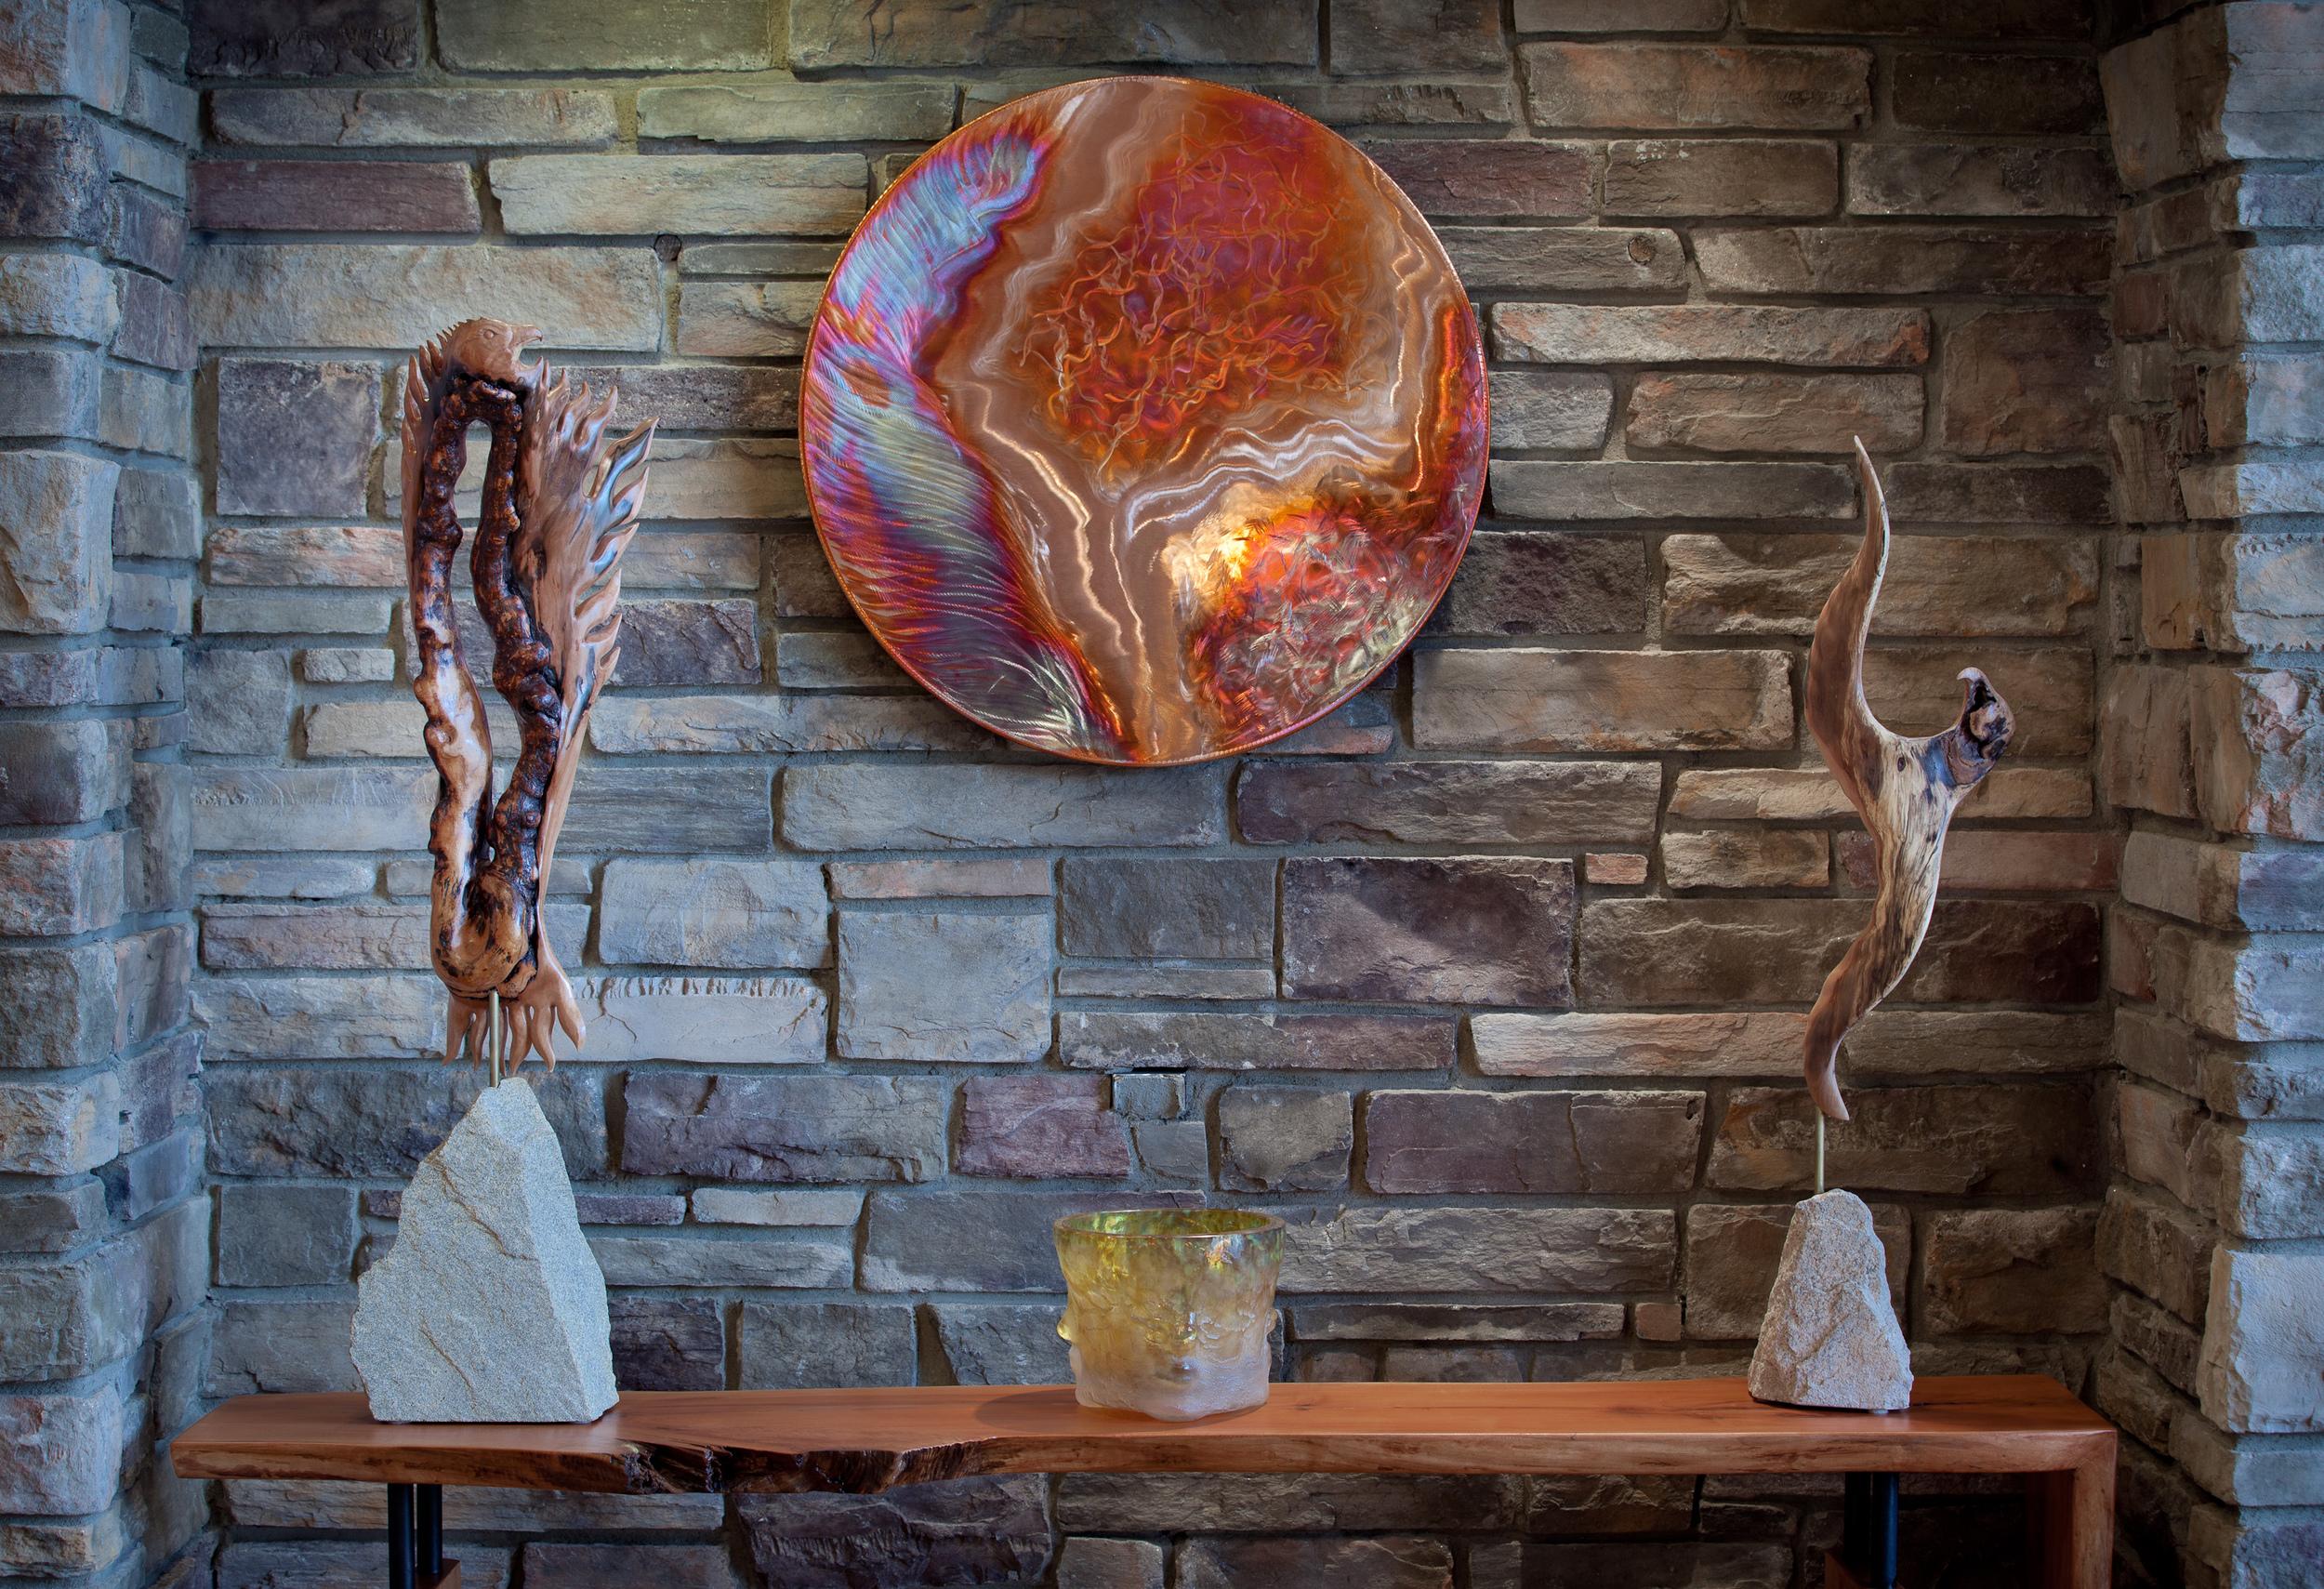 Craig Sculpture Studio 54 Gallery-9472.jpg